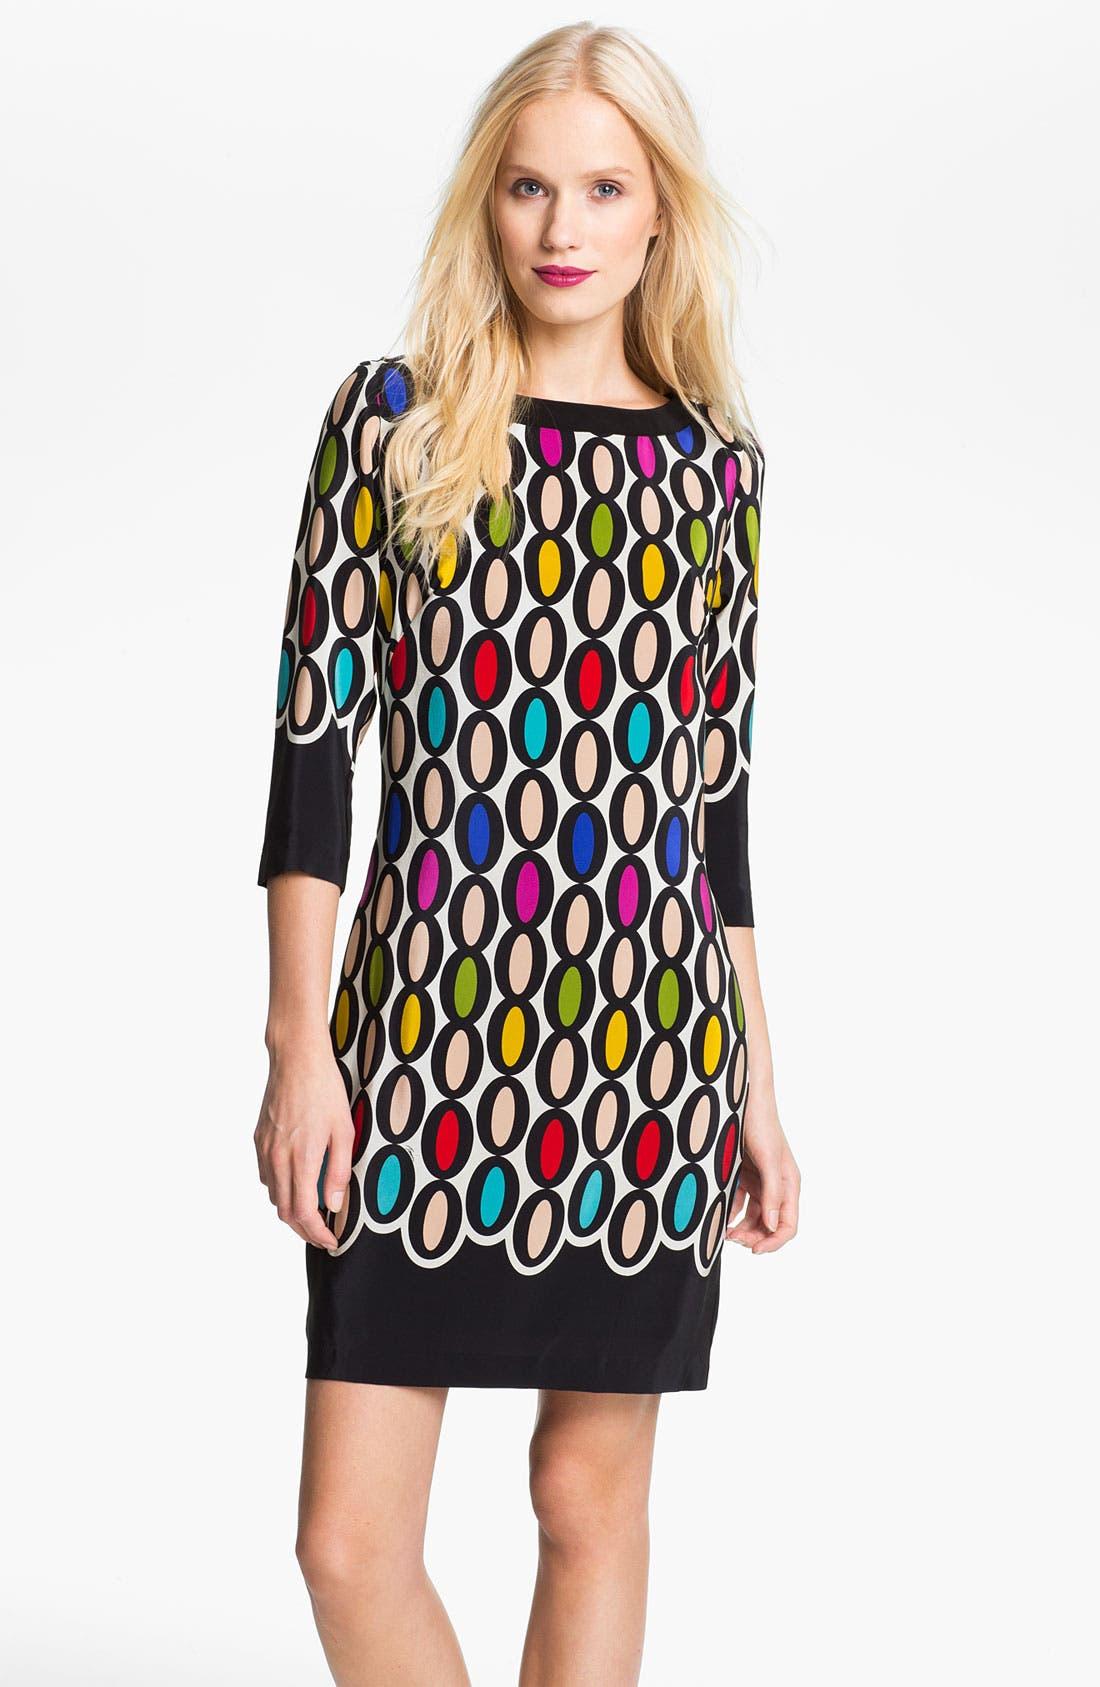 Alternate Image 1 Selected - Trina Turk 'Ronson' Silk Shift Dress